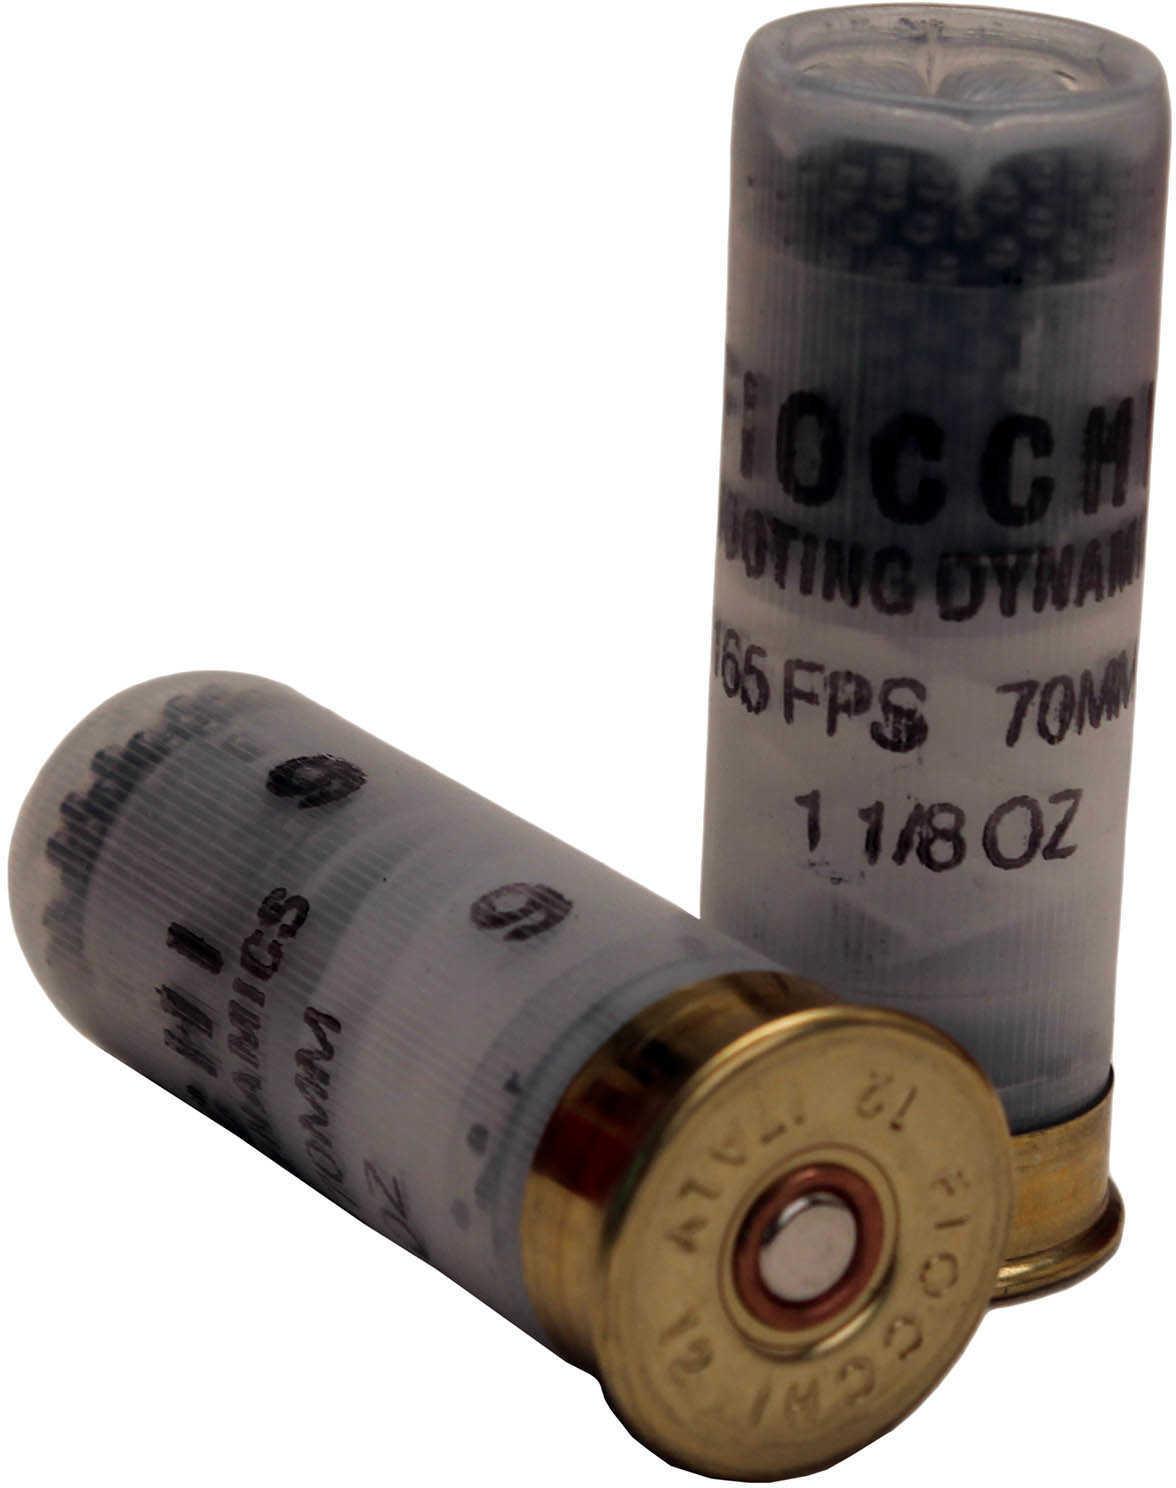 "Shooting Dynamics 12 Gauge 2.75"" (Per 25) Size 9, 1 1/8 Oz Md: 12Sd18L9"